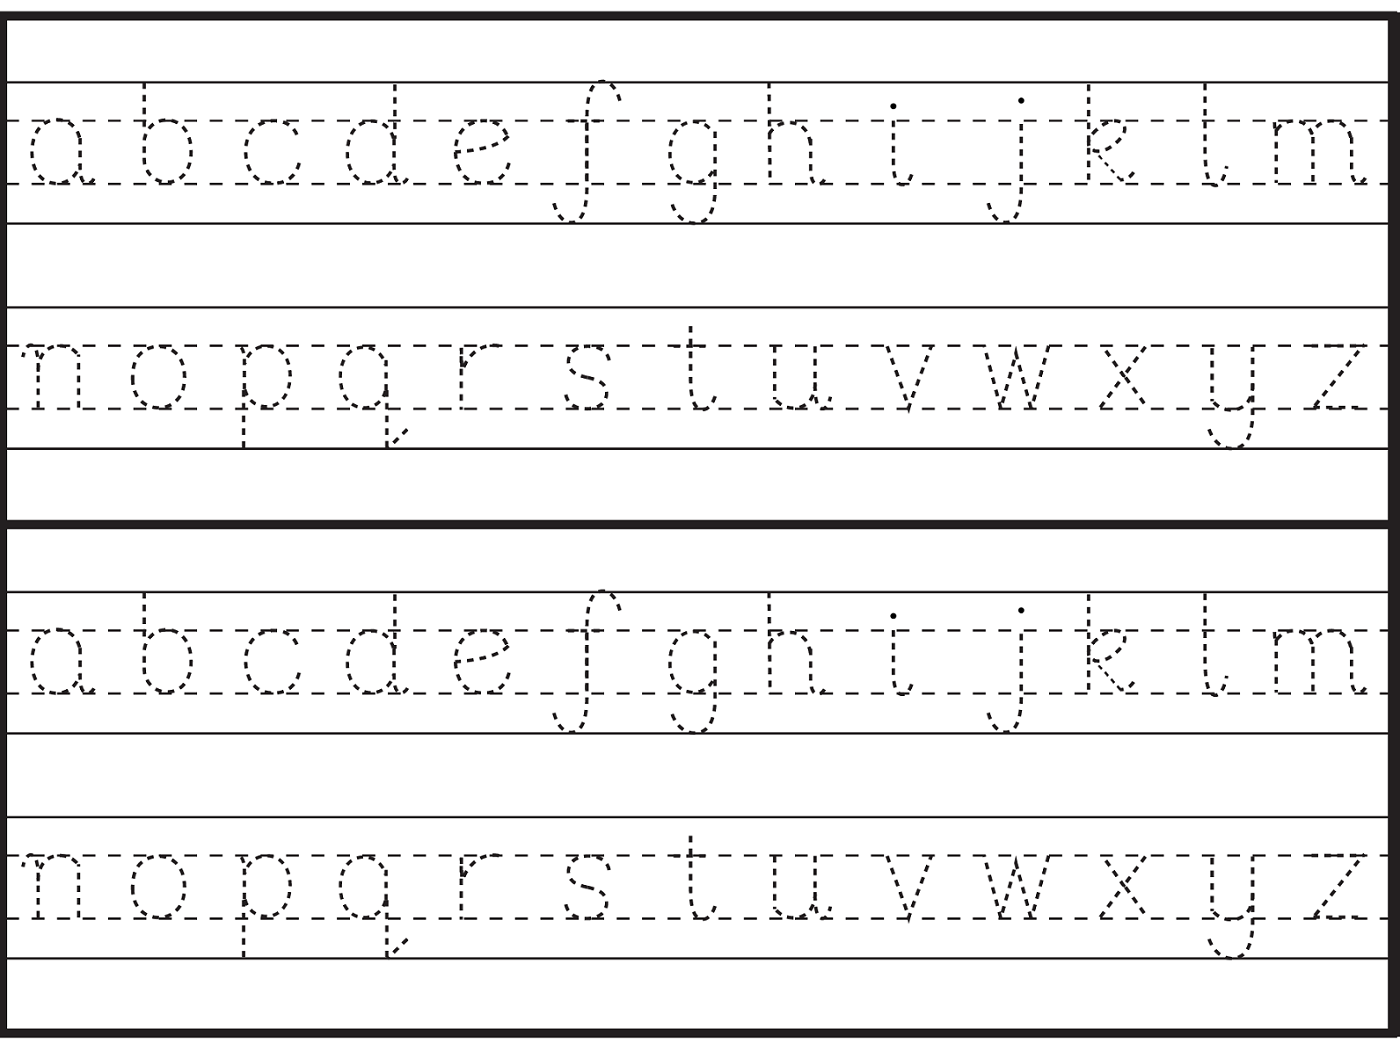 Childrens Printable Alphabet Worksheets Letters Sheets English